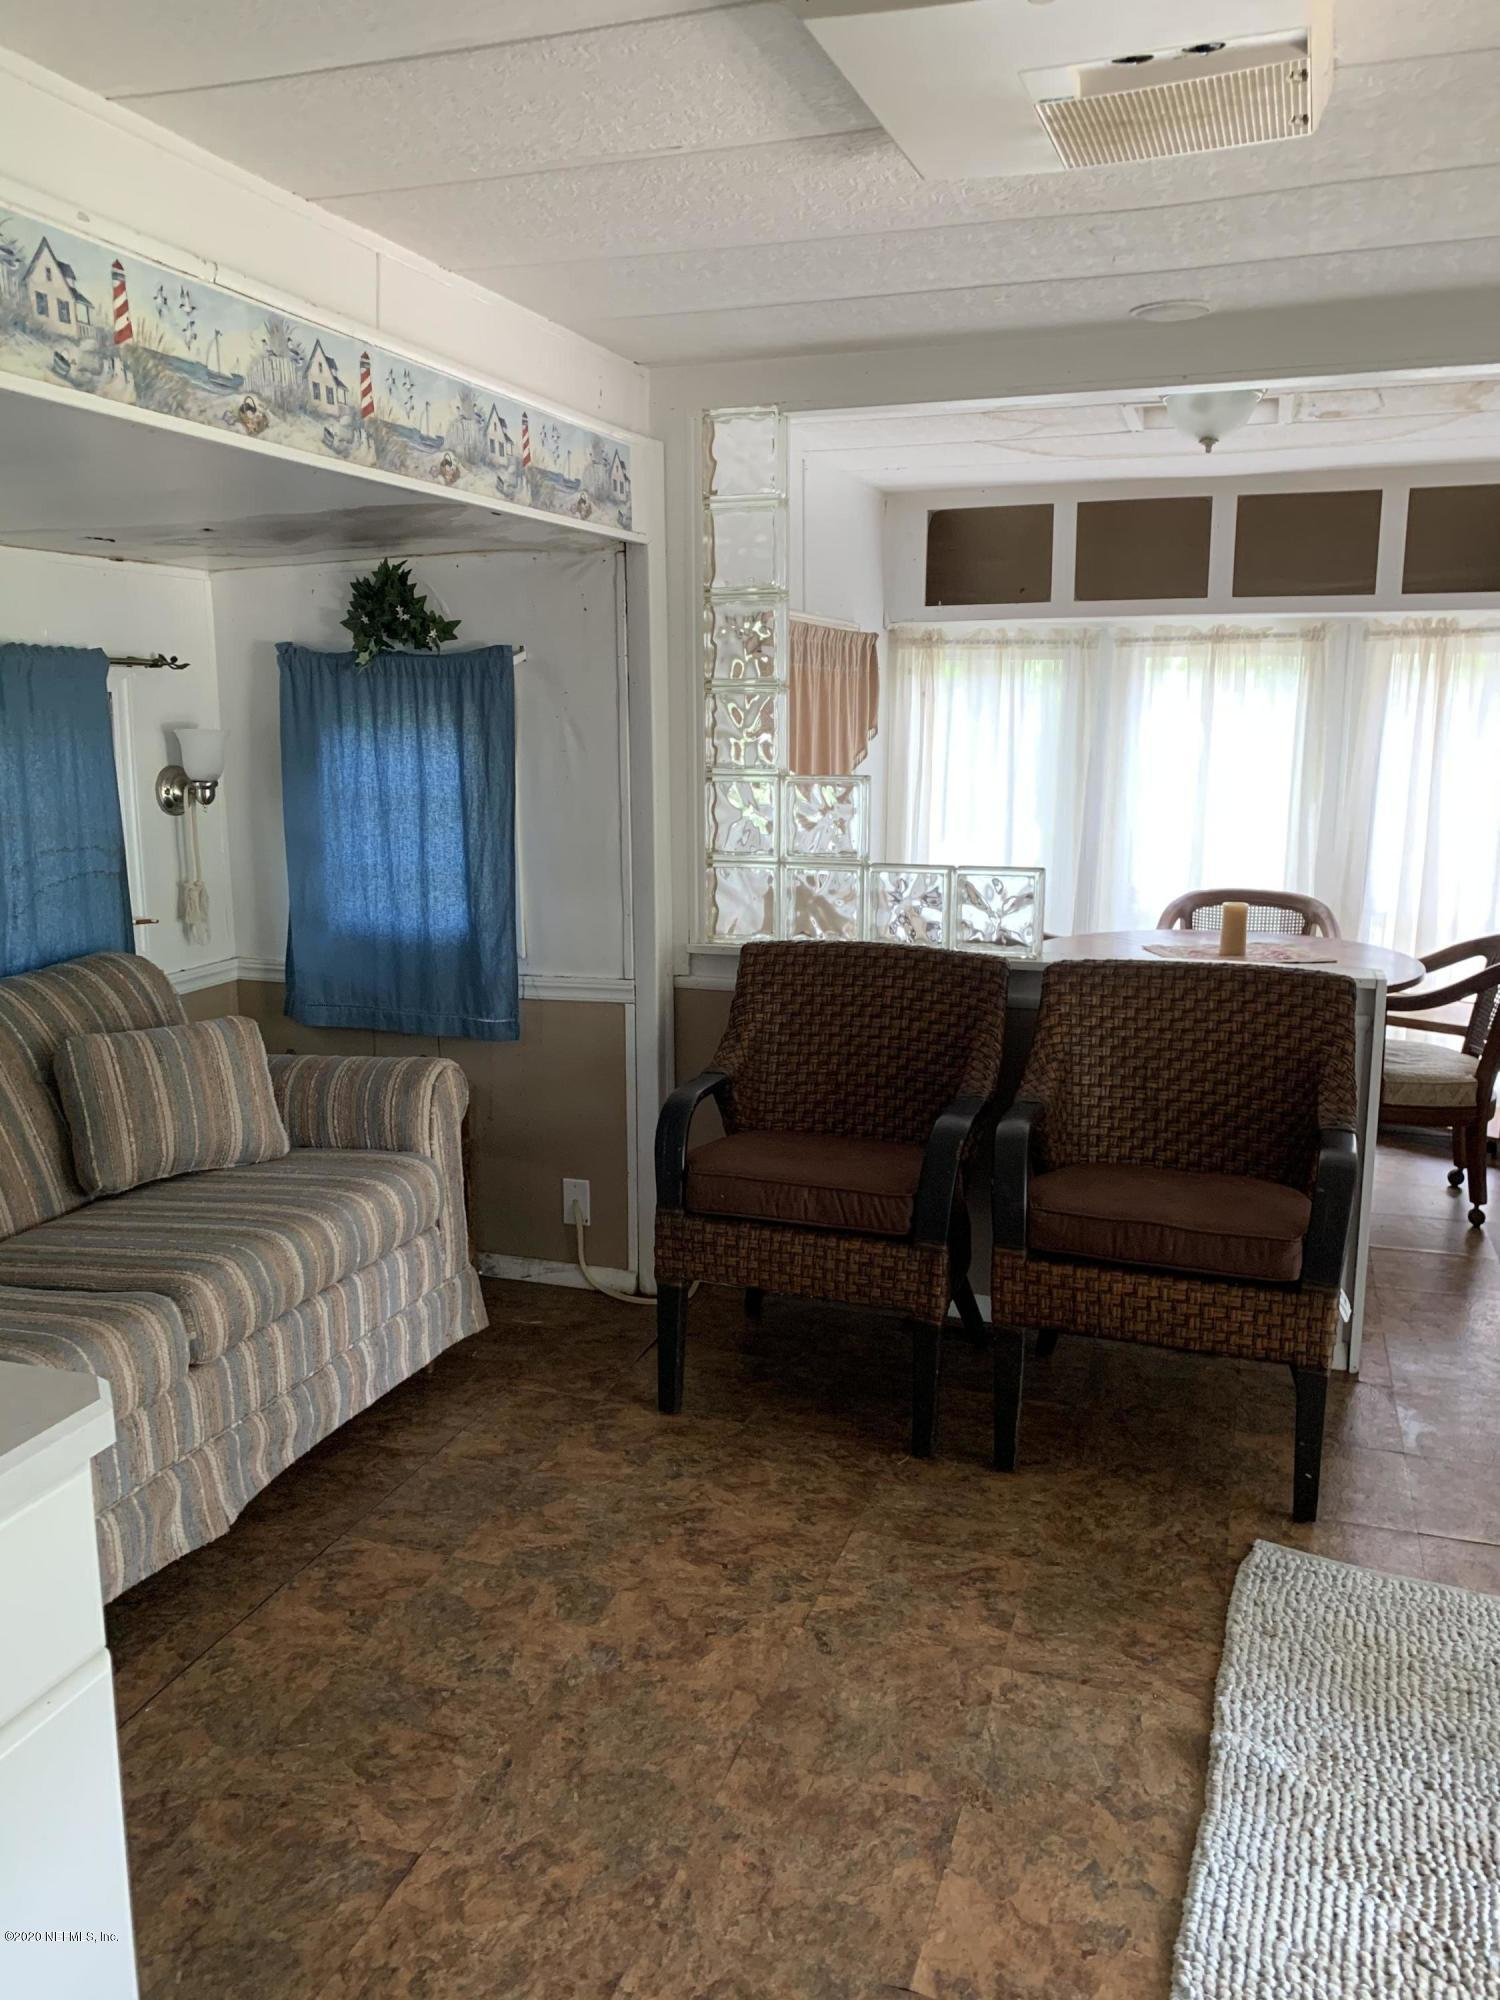 153 BOCA RATON, SATSUMA, FLORIDA 32189, 1 Bedroom Bedrooms, ,1 BathroomBathrooms,Residential,For sale,BOCA RATON,1020801